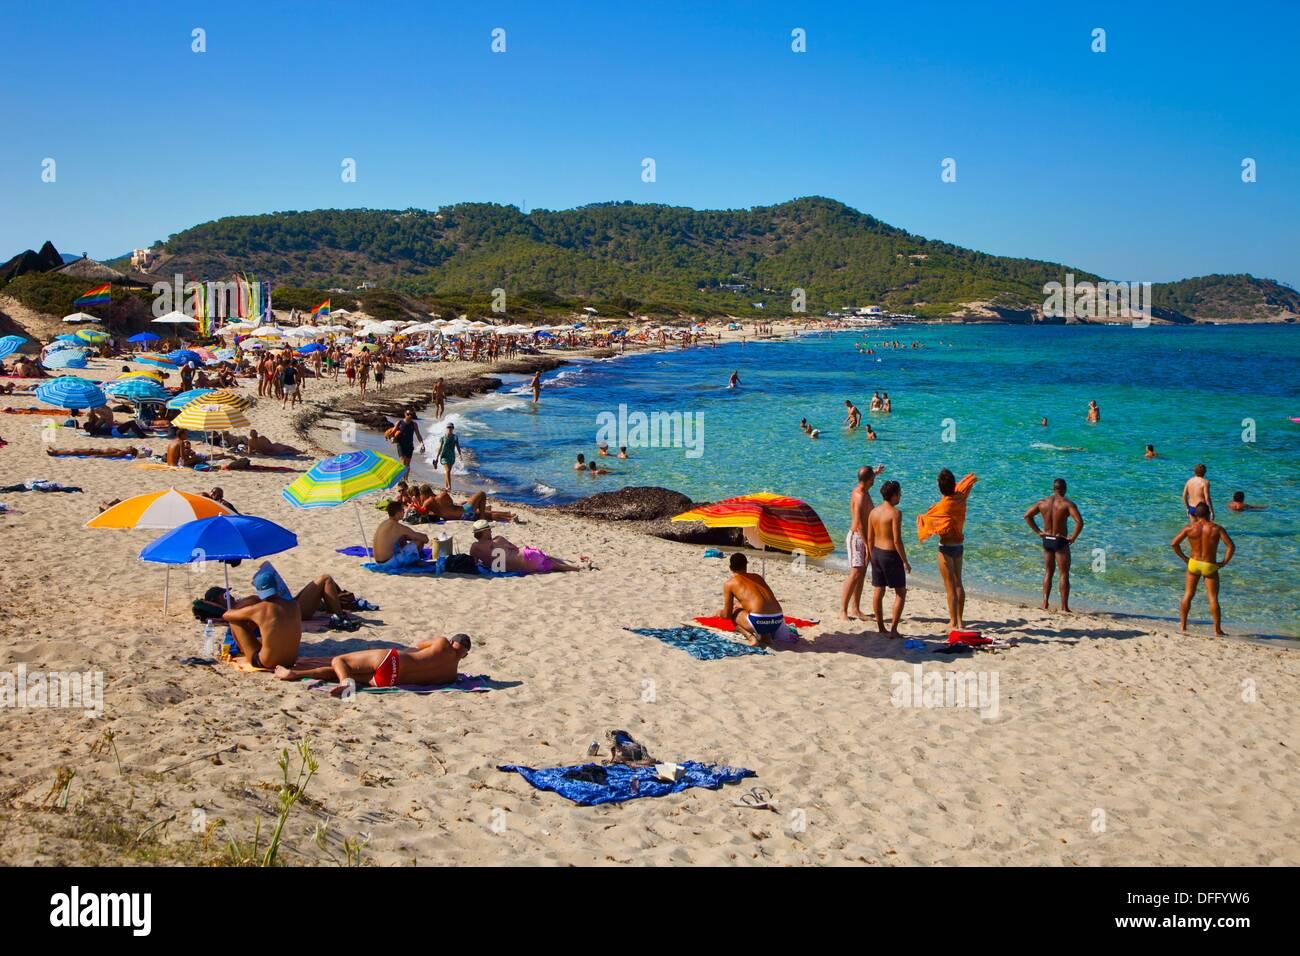 Es Cavallet. Beach. Ibiza. Balearic Islands. Spain Stock